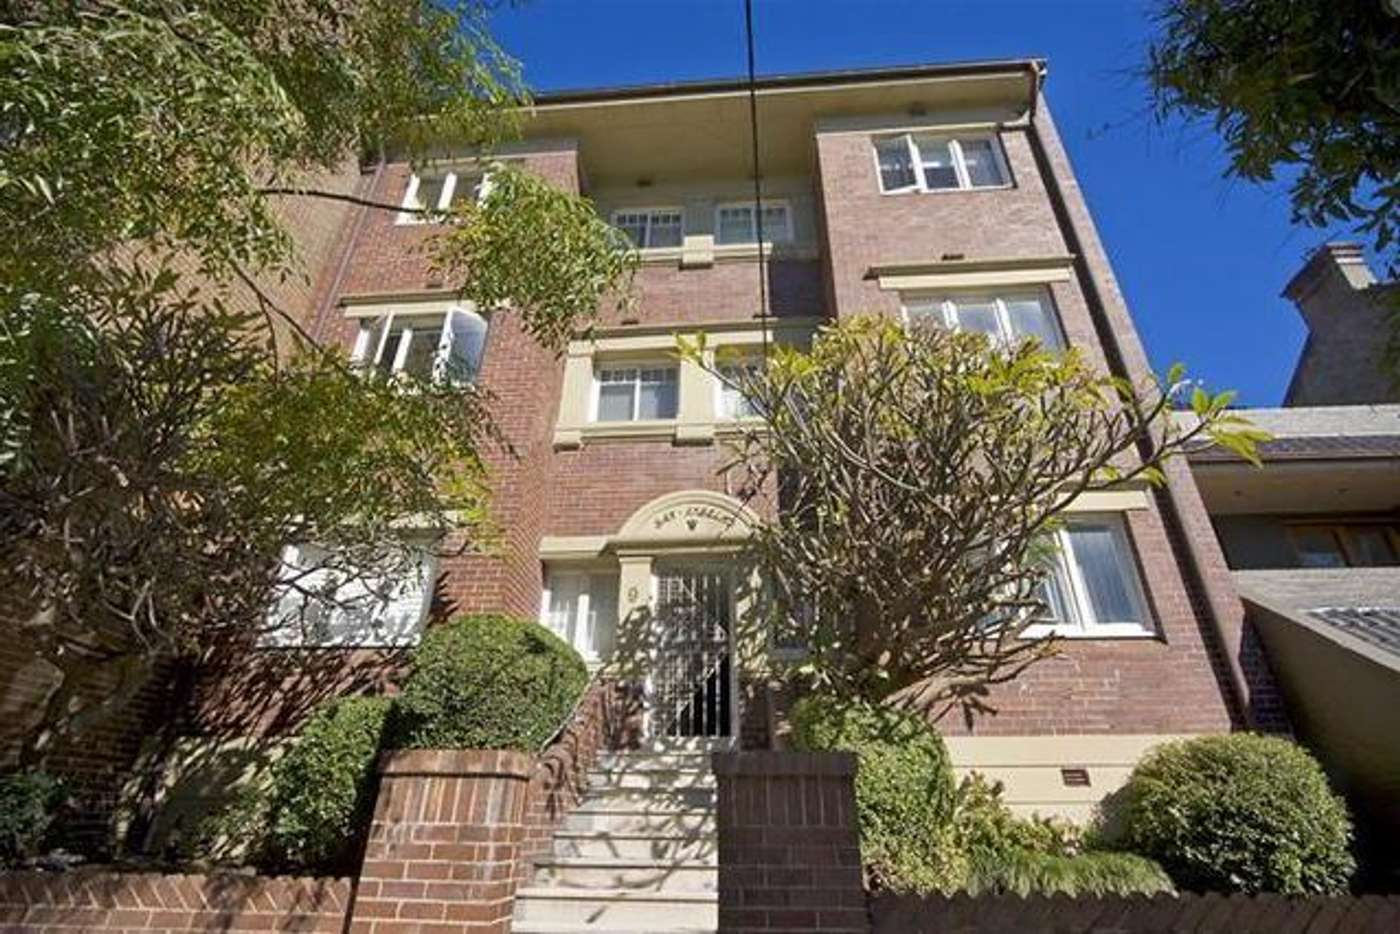 Main view of Homely apartment listing, 5/9 Macdonald Street, Paddington NSW 2021